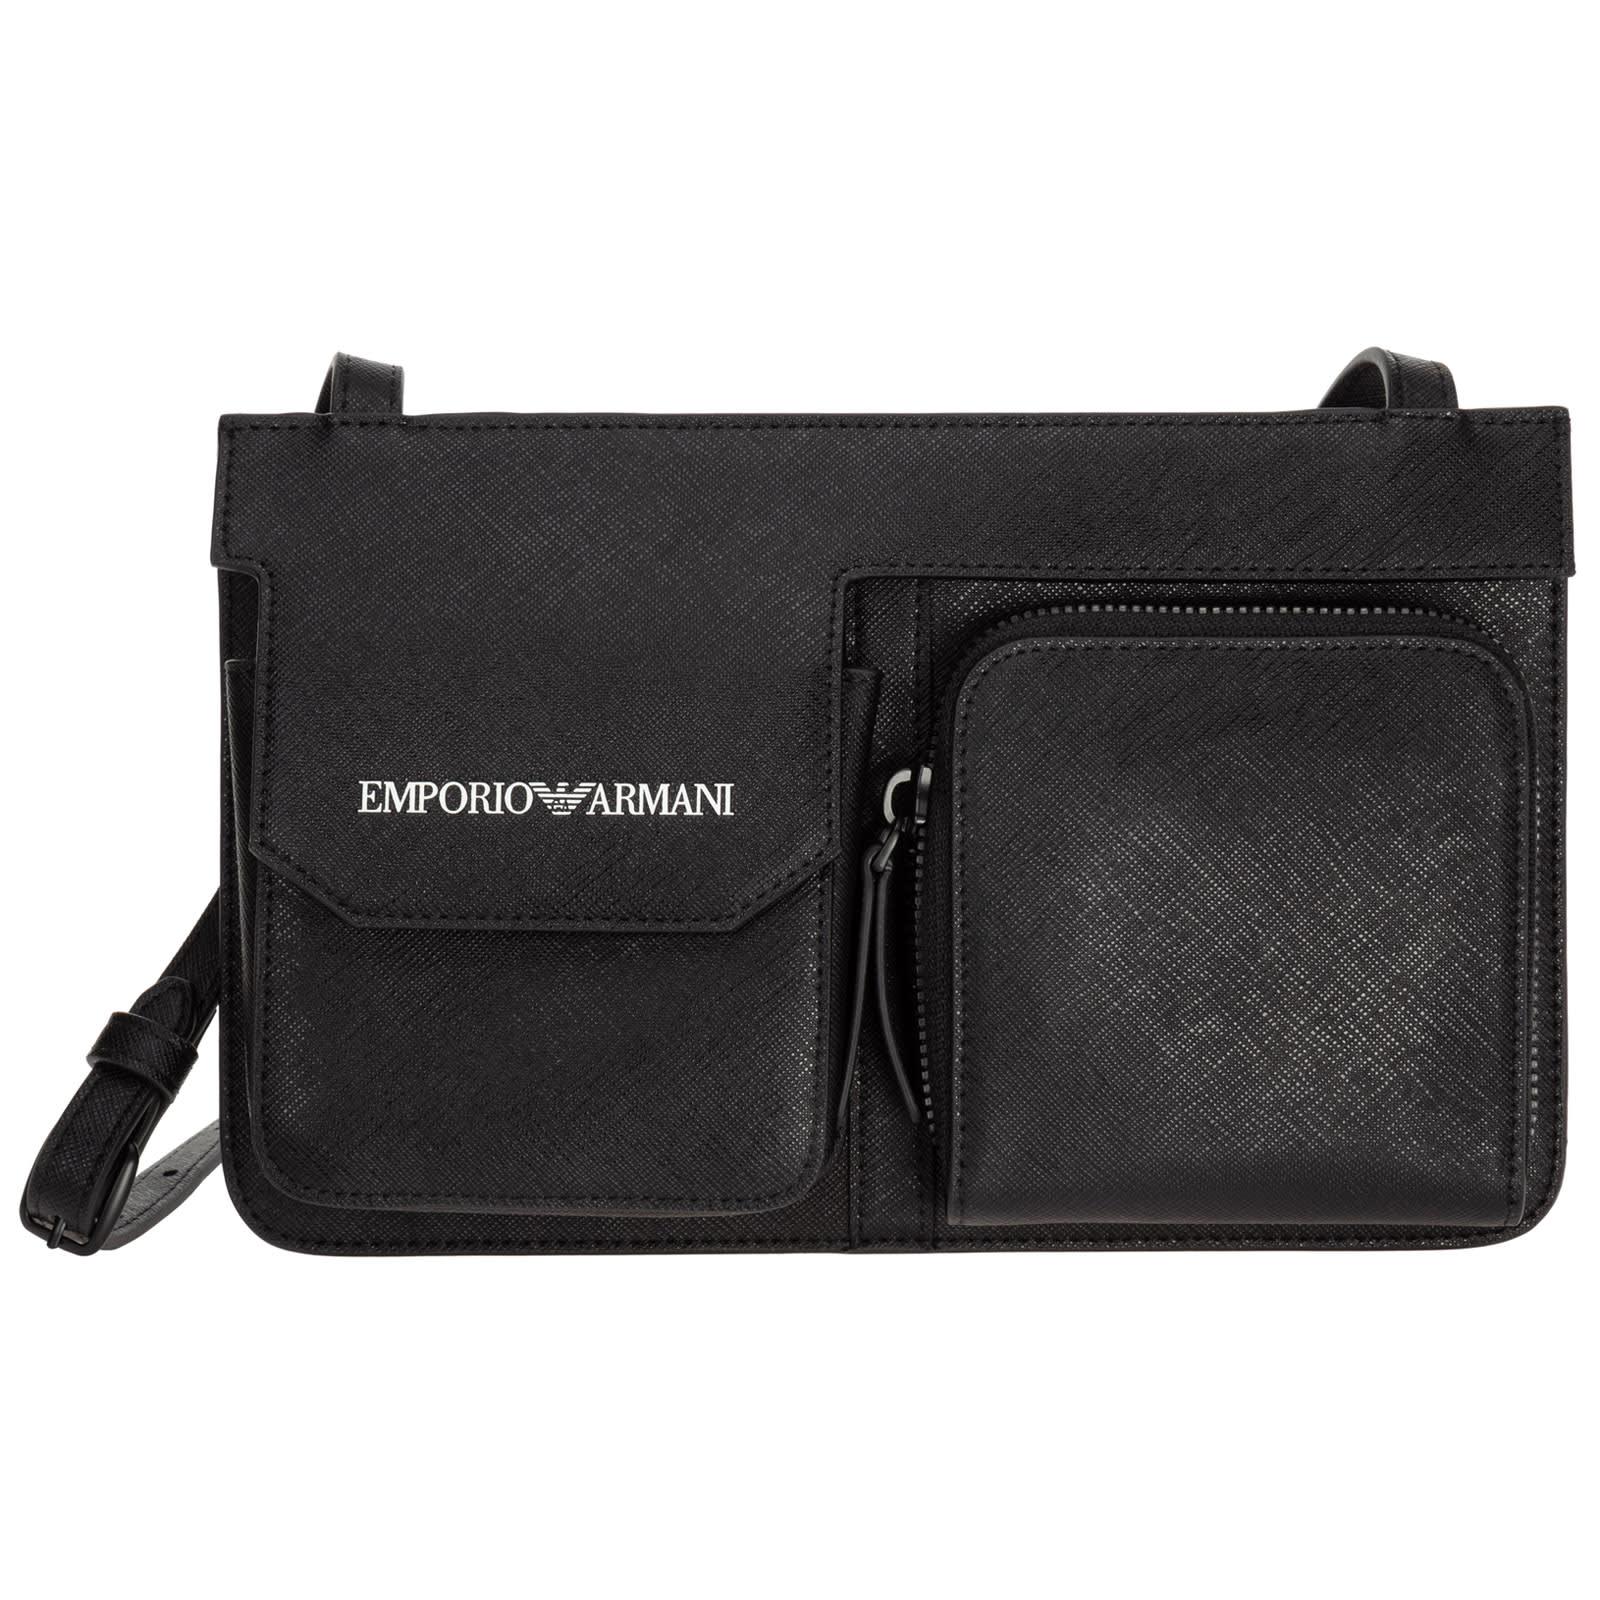 Emporio Armani MYEA CROSSBODY BAGS